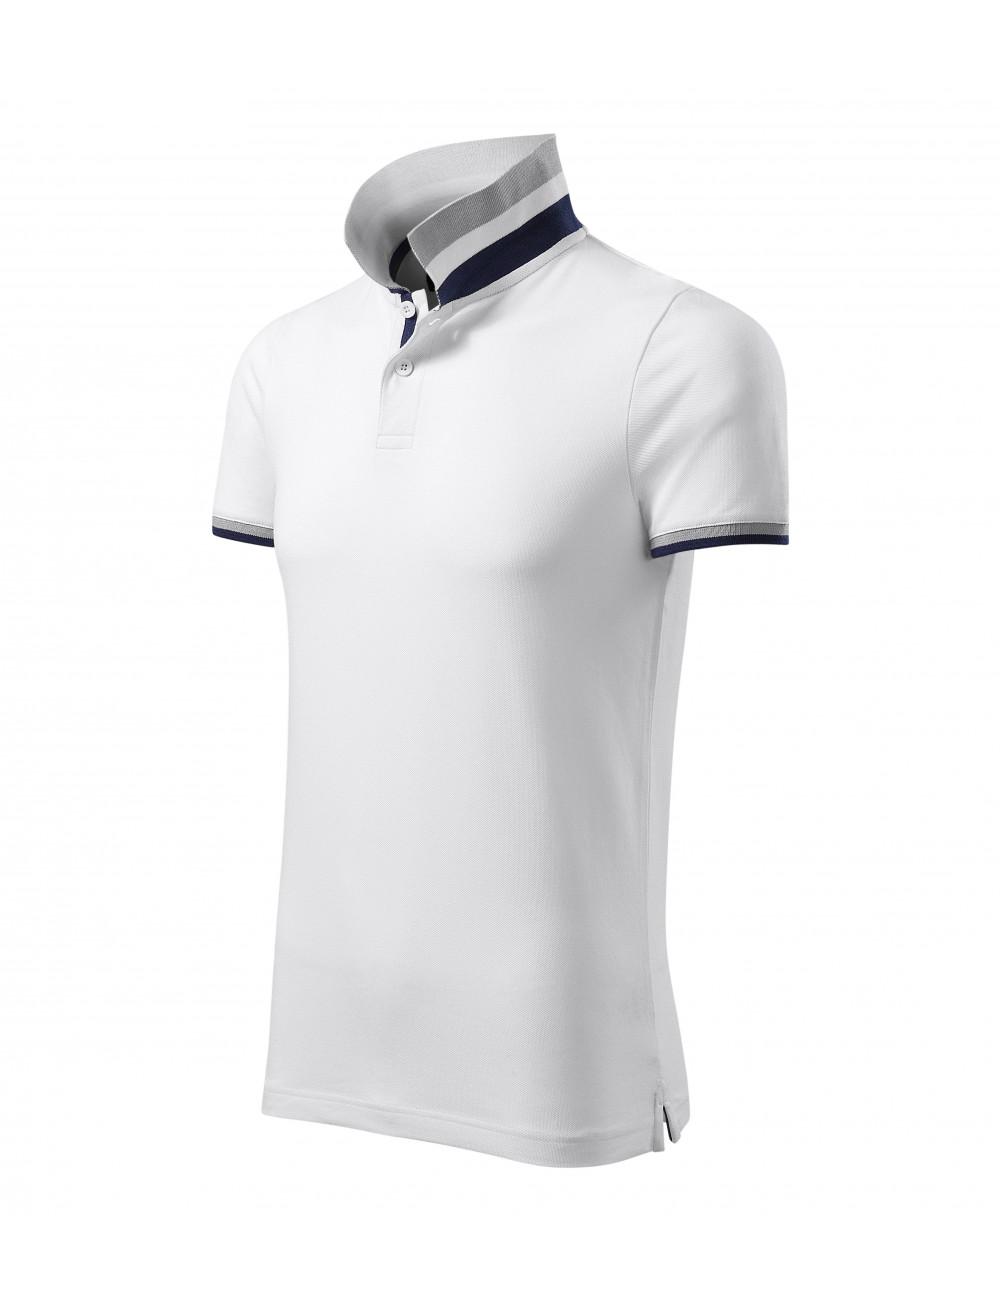 Adler MALFINIPREMIUM Koszulka polo męska Collar Up 256 biały